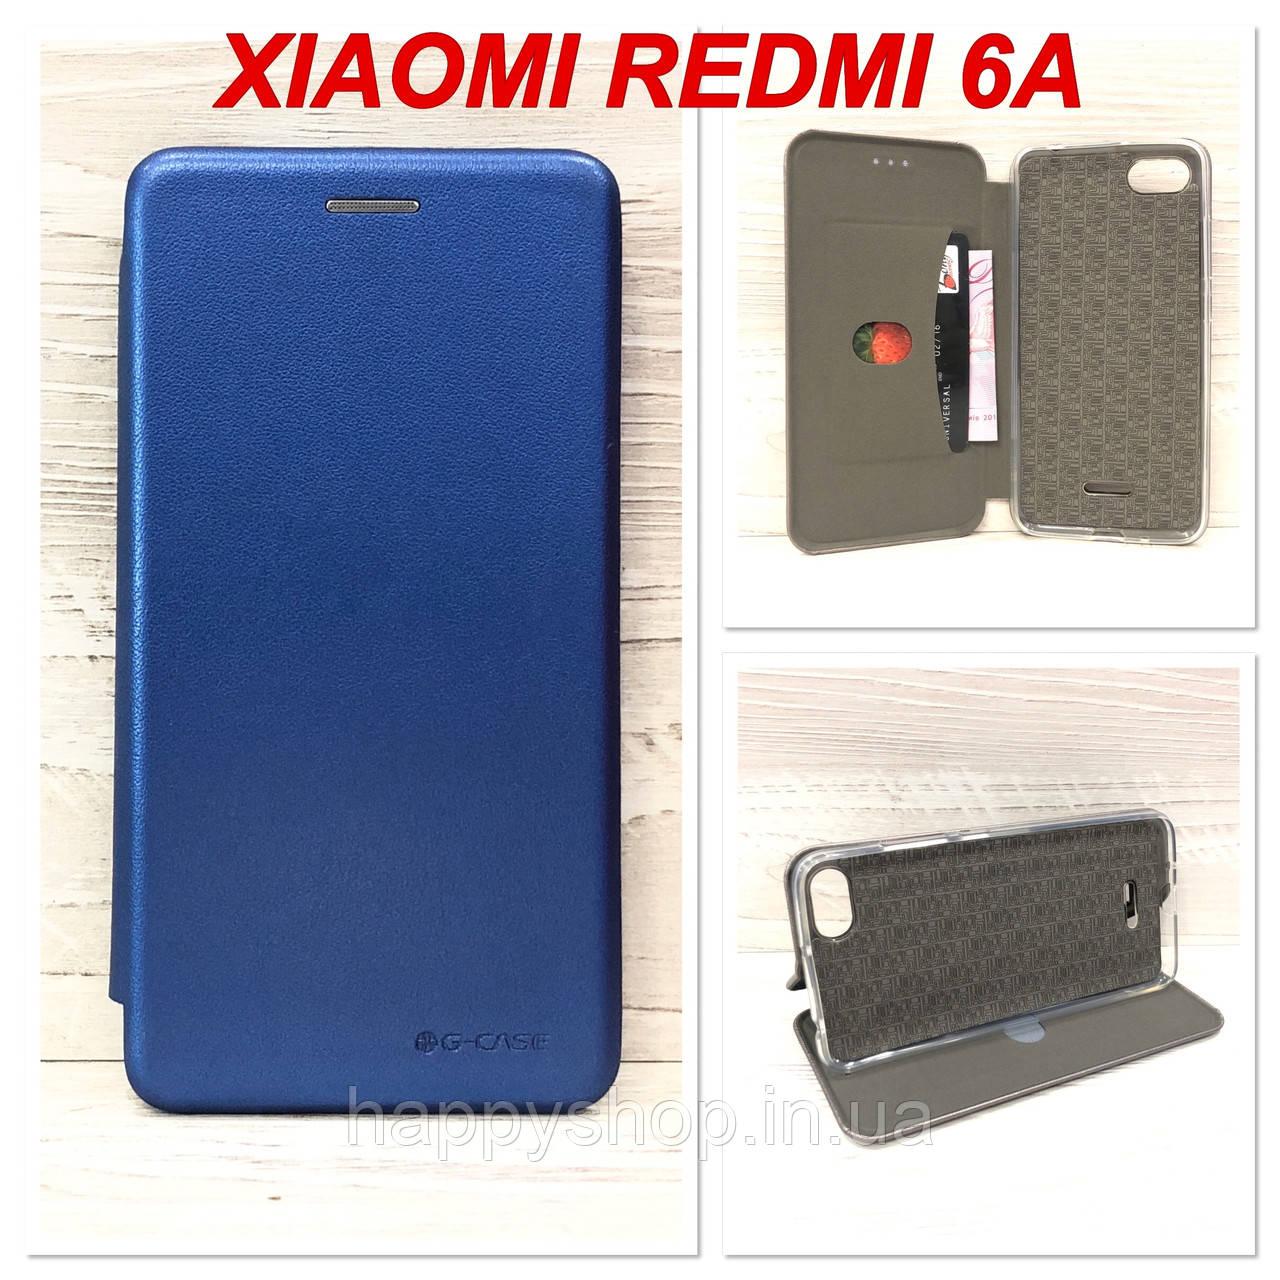 Чехол-книжка G-Case для Xiaomi Redmi 6A (Синий)